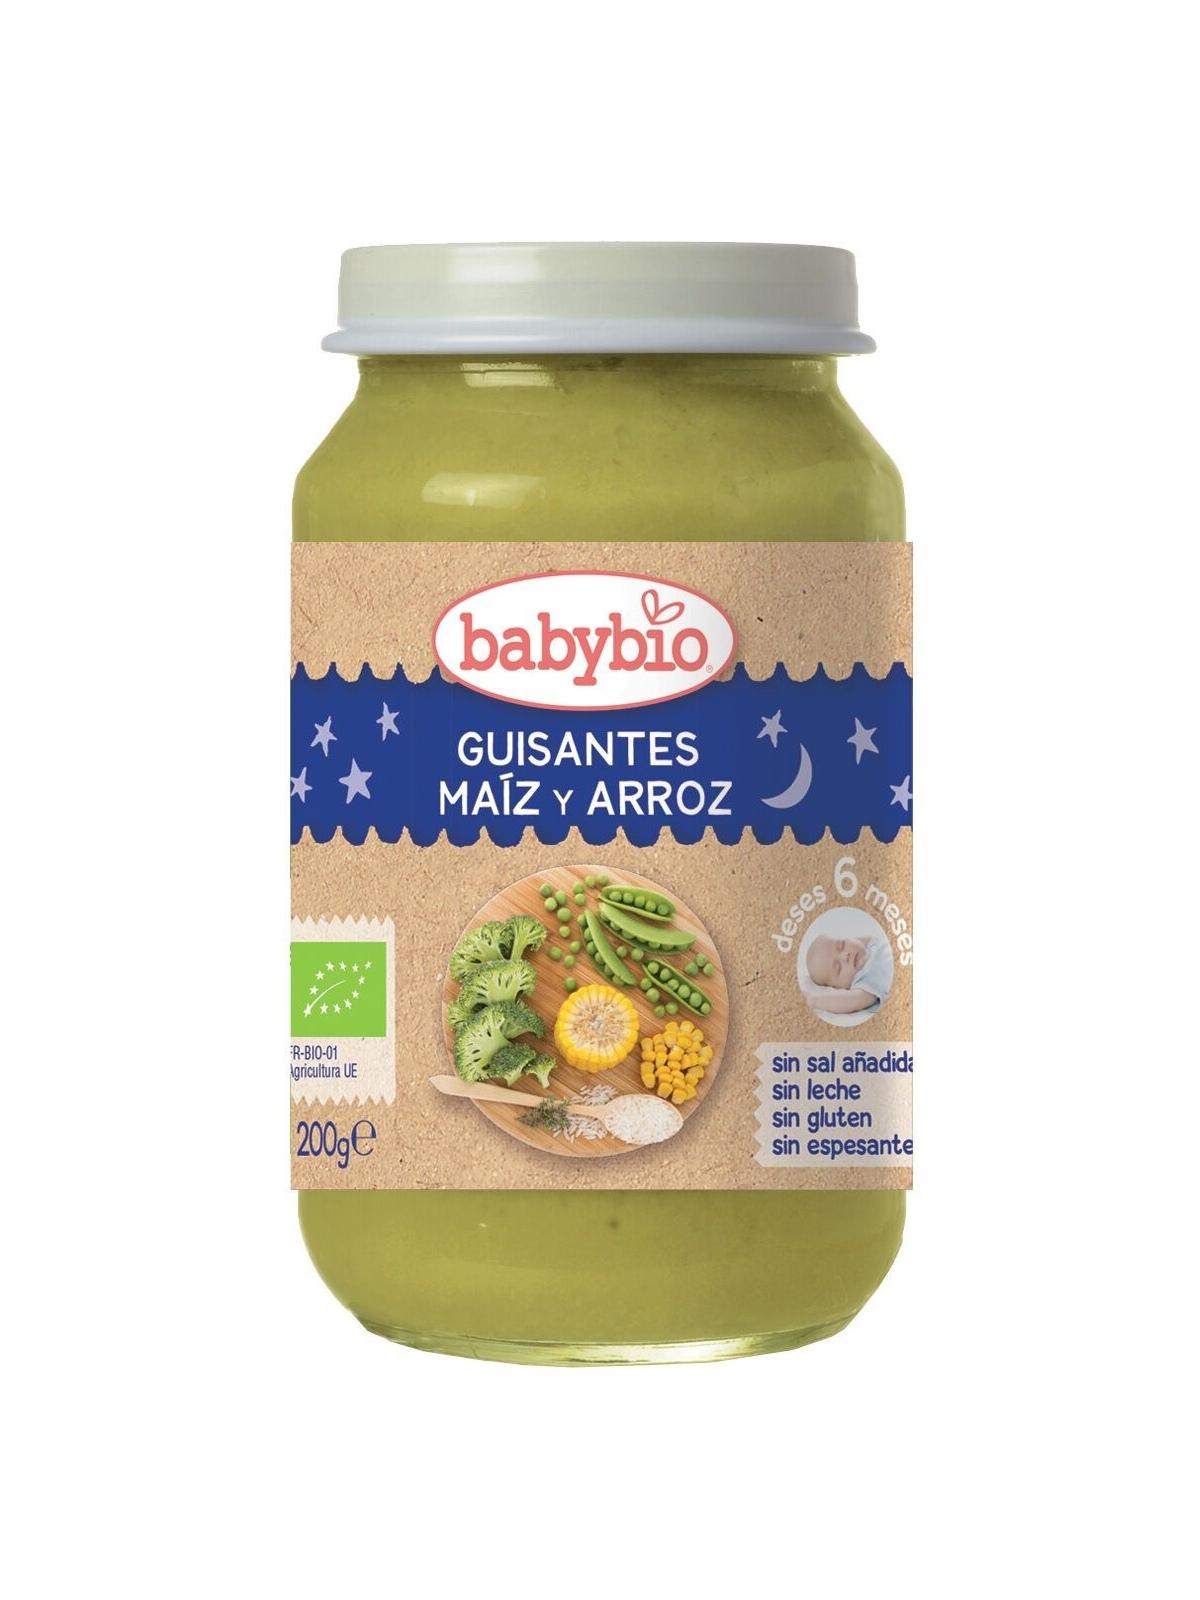 Babybio Buenas Noches Guisantes-Maiz-Arroz